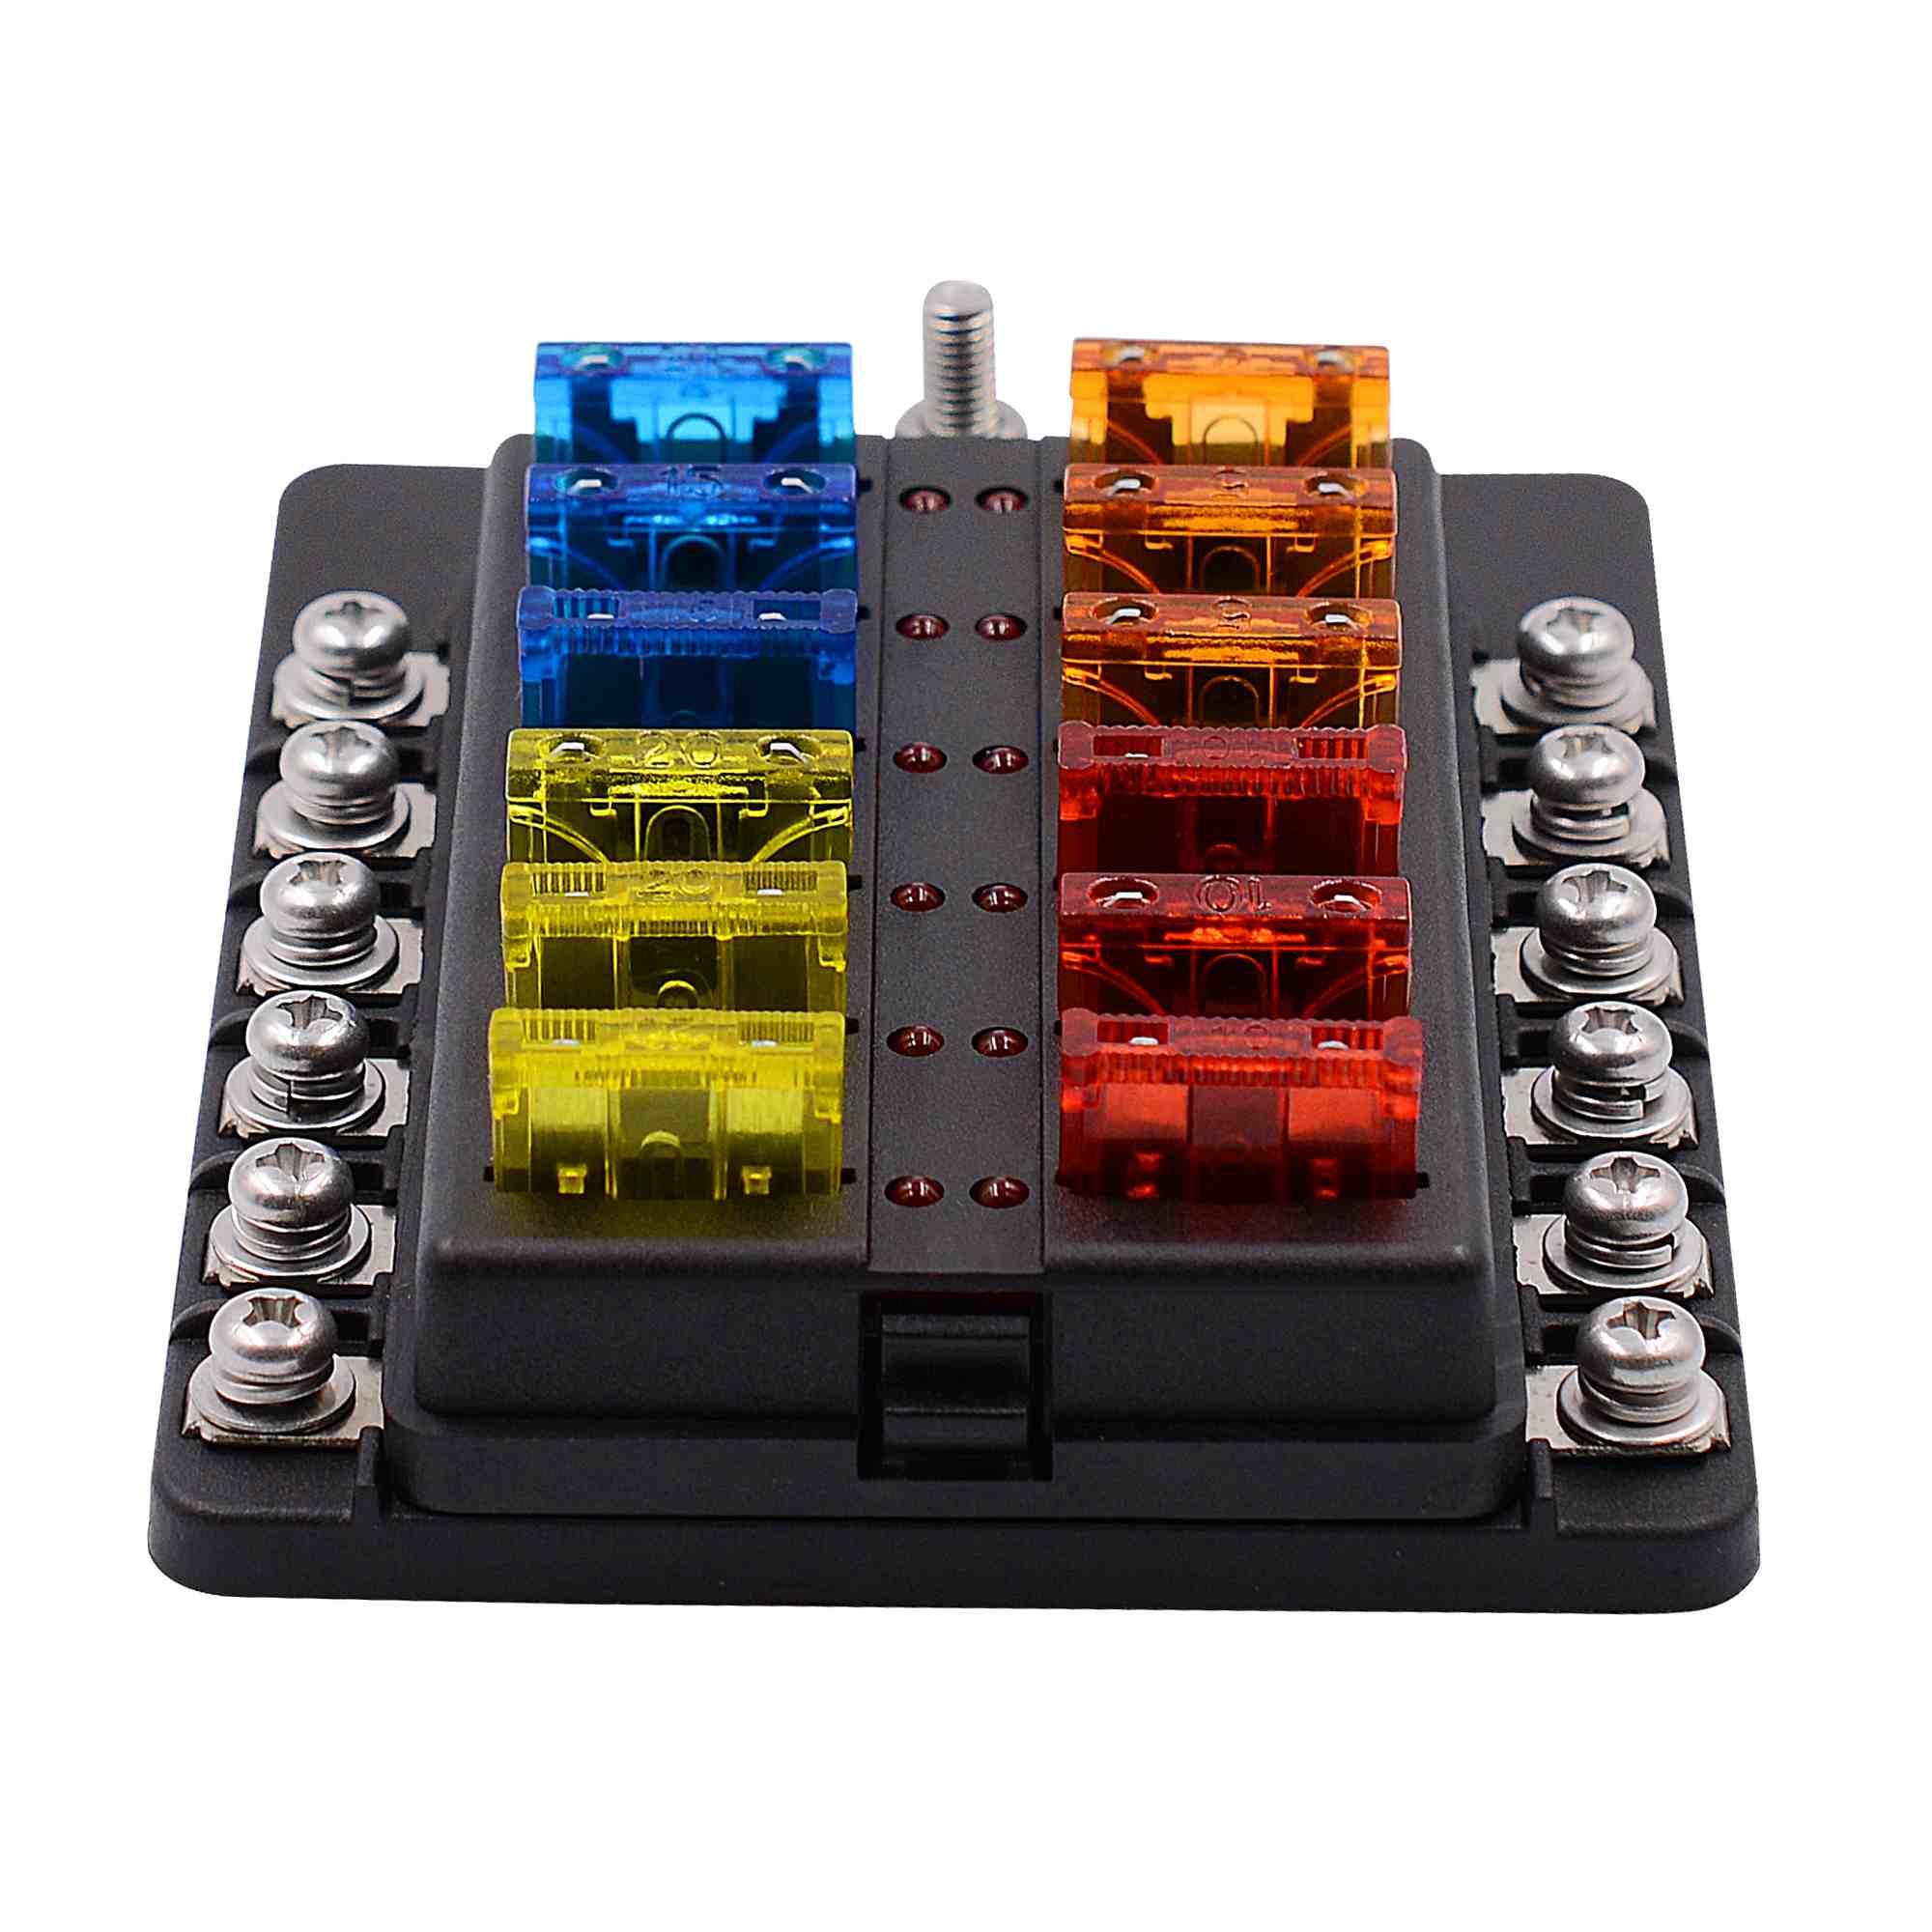 12 way car circuit blade fuse box holder 12v car